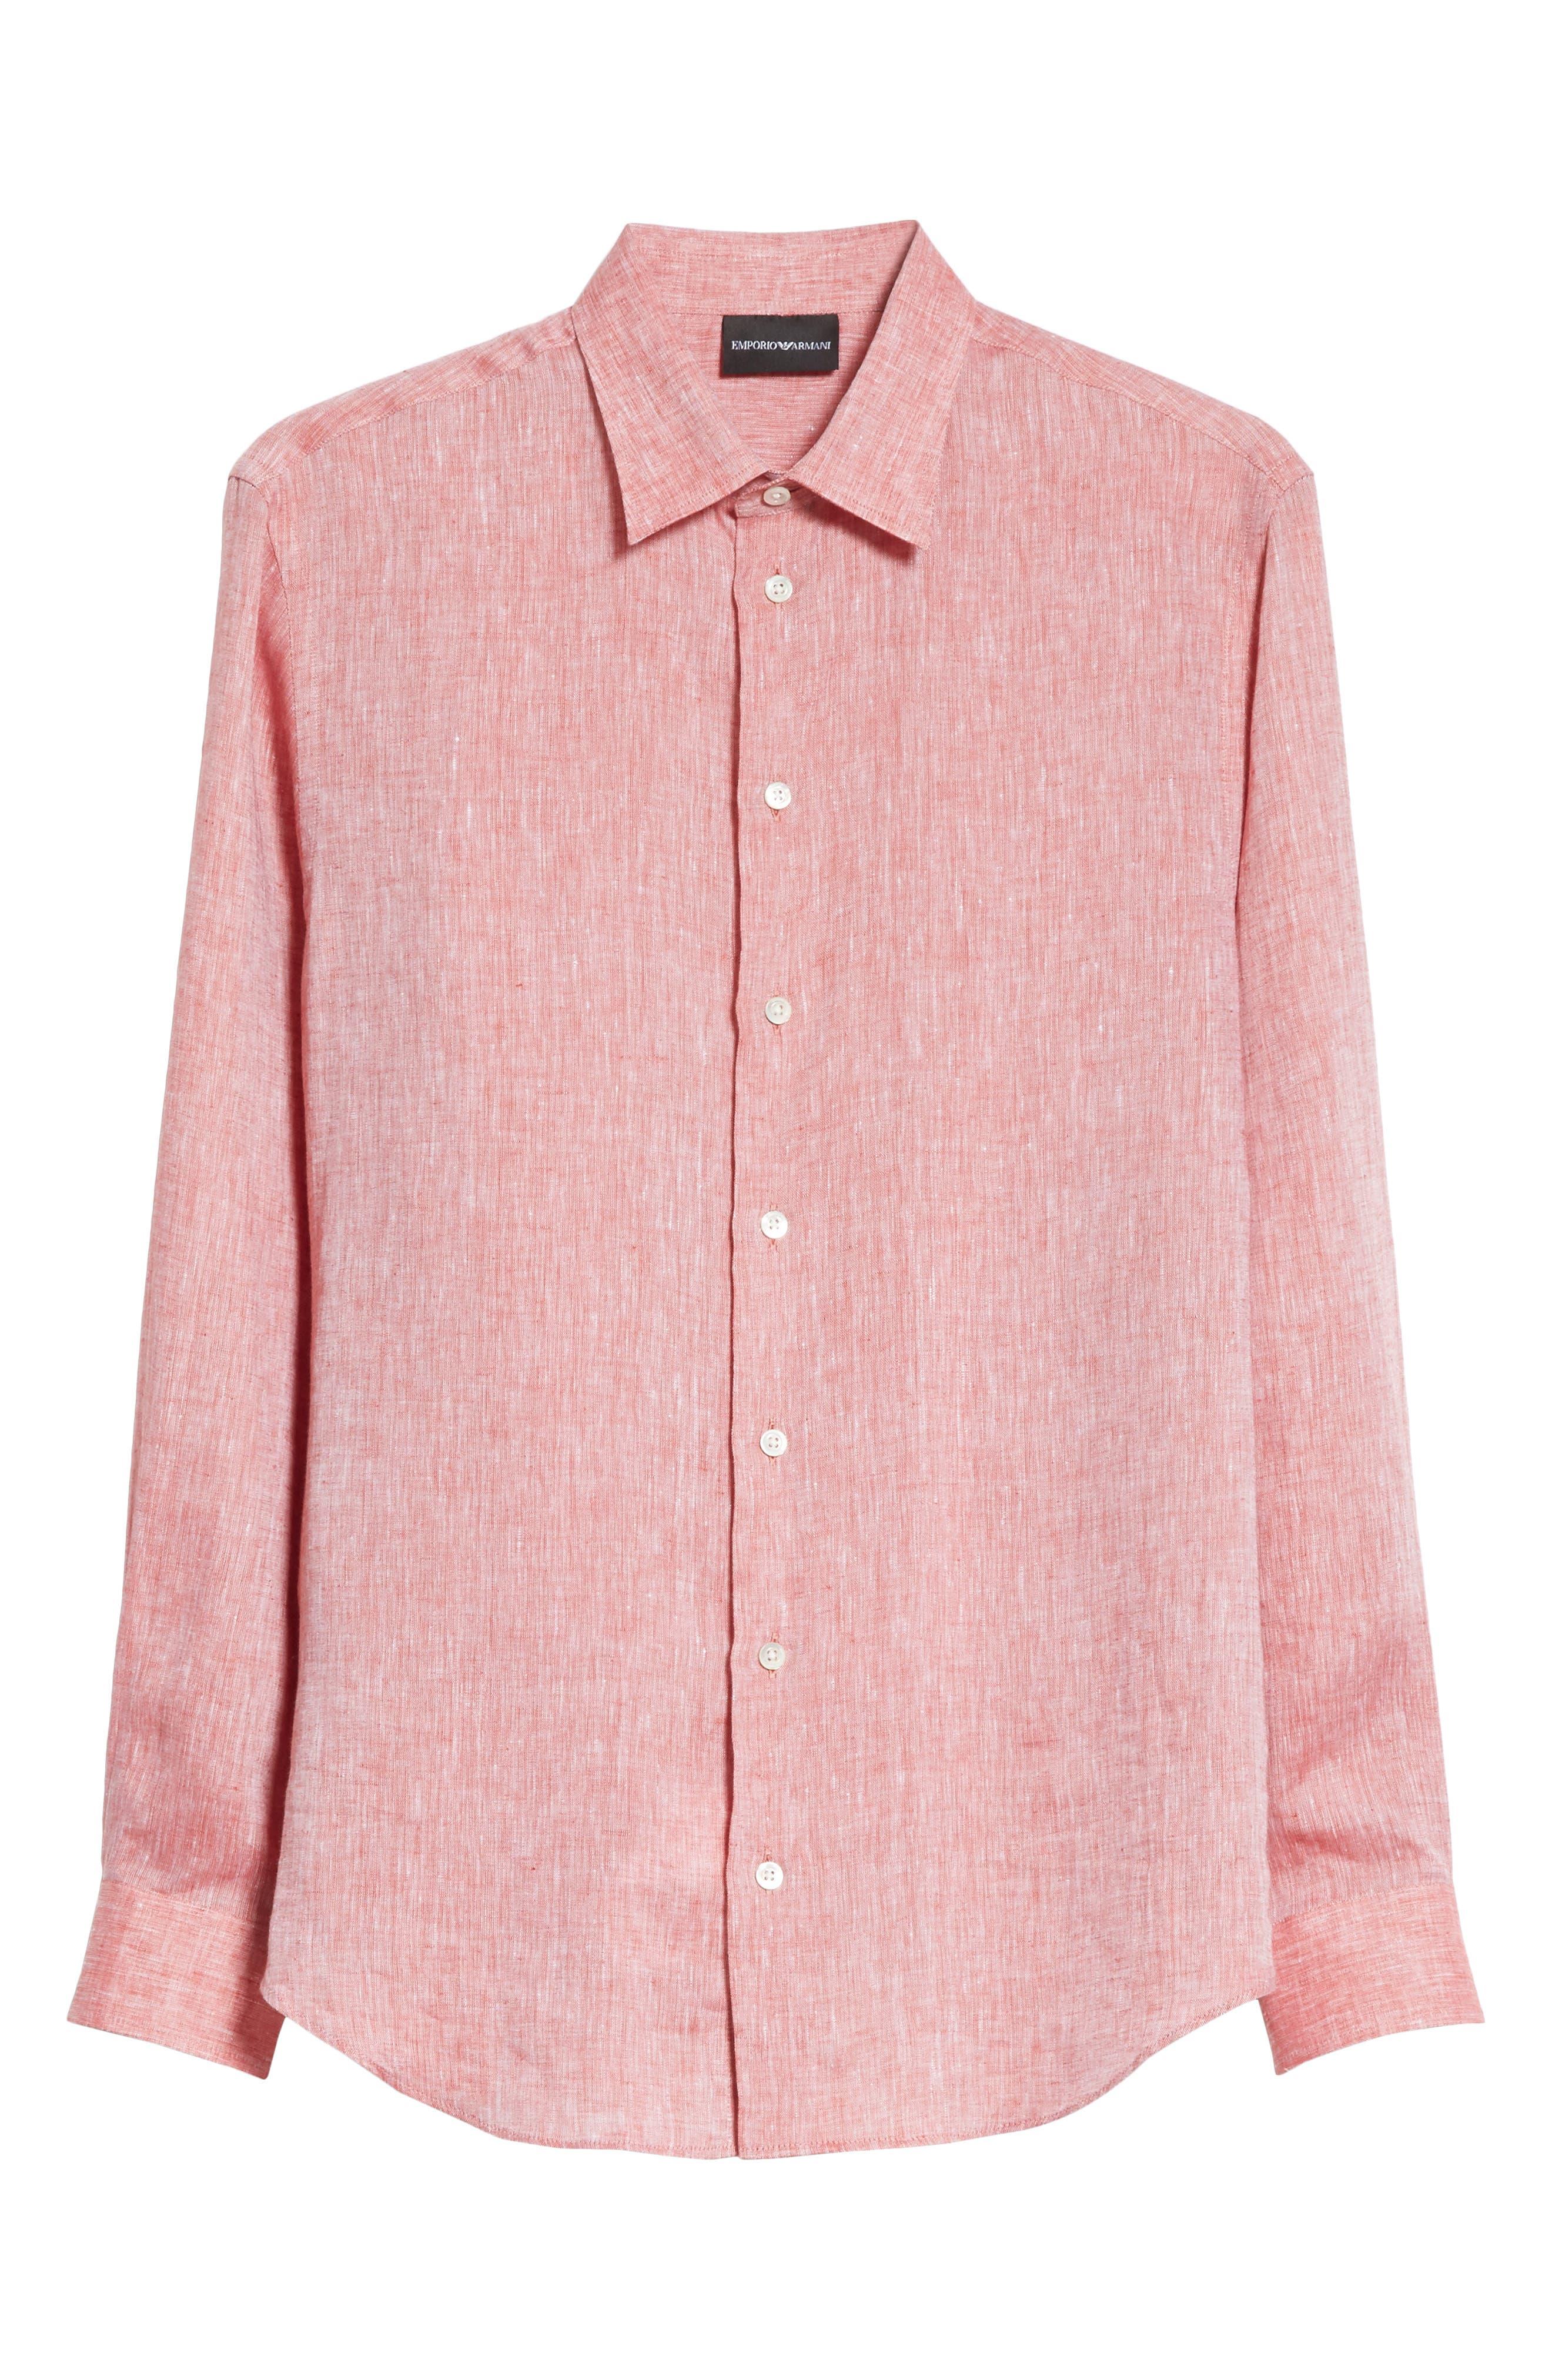 Regular Fit Chambray Sport Shirt,                             Alternate thumbnail 6, color,                             Medium Red